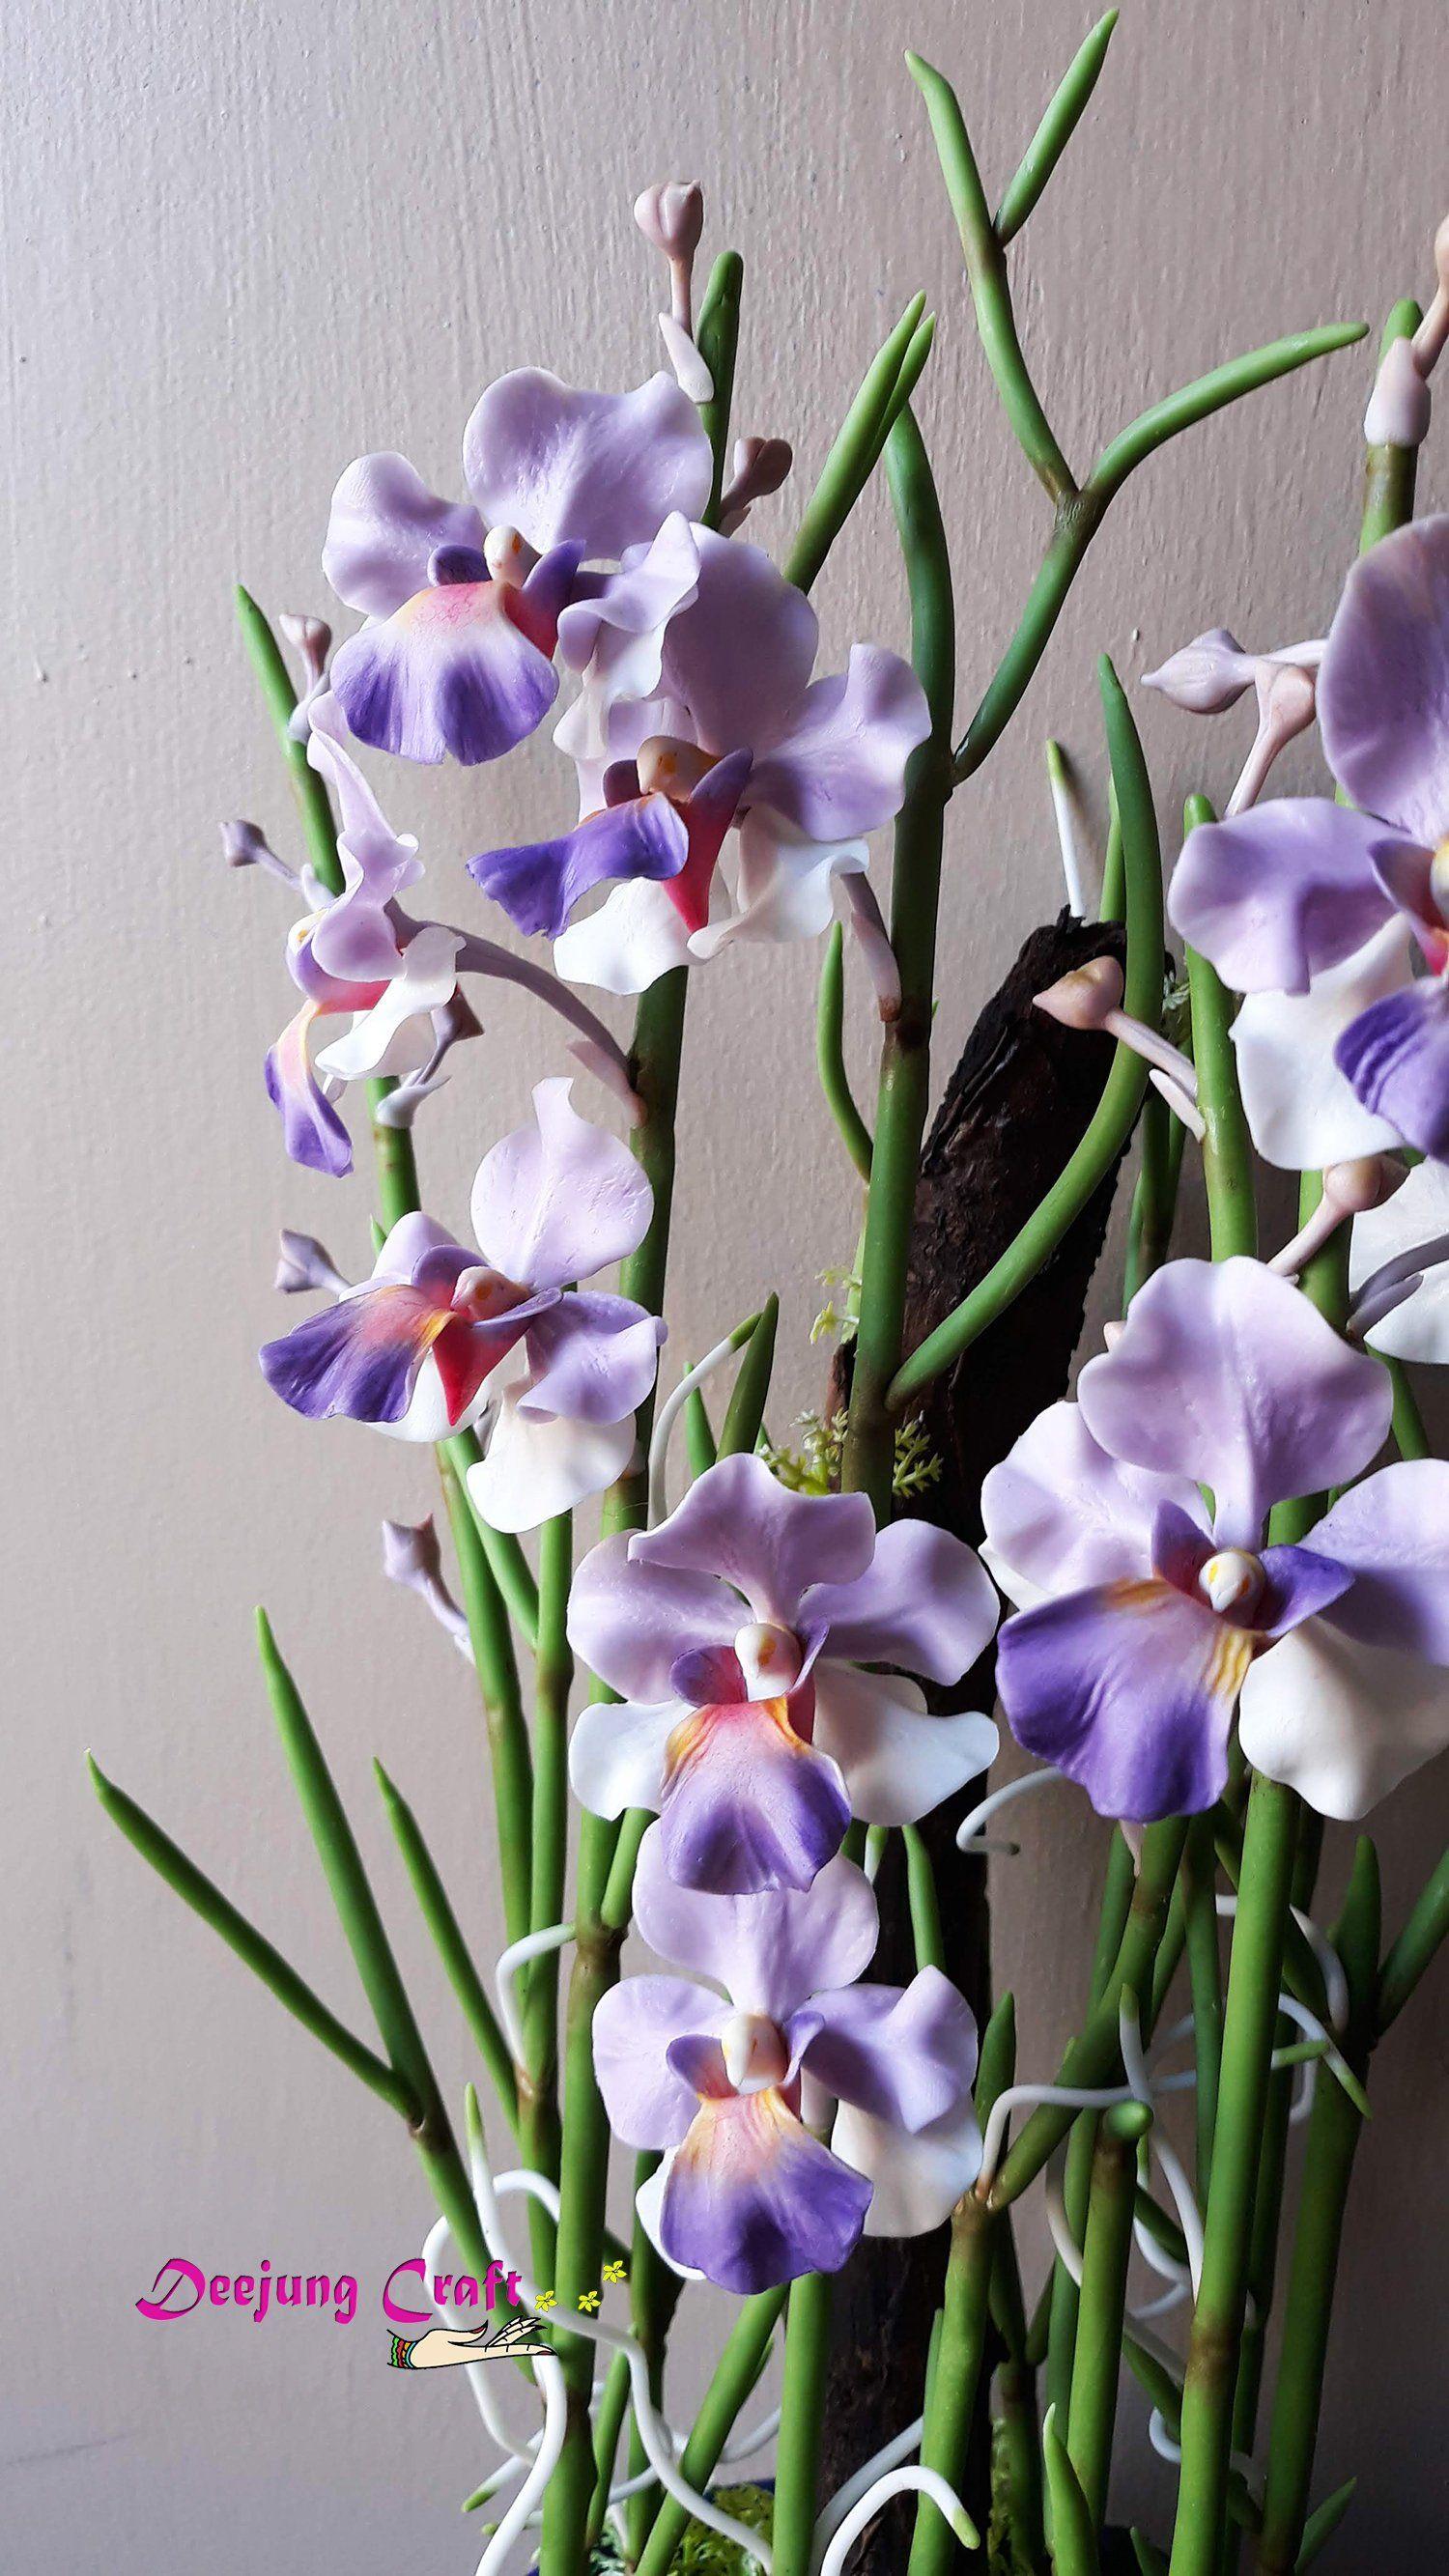 My Etsy Shop Vanda Miss Joaquim Gift Homedecor Purpleorchids Tropicalorchids Conservatory Flower Hawai Handmade Etsy Gifts Etsy Crafts Flower Creation